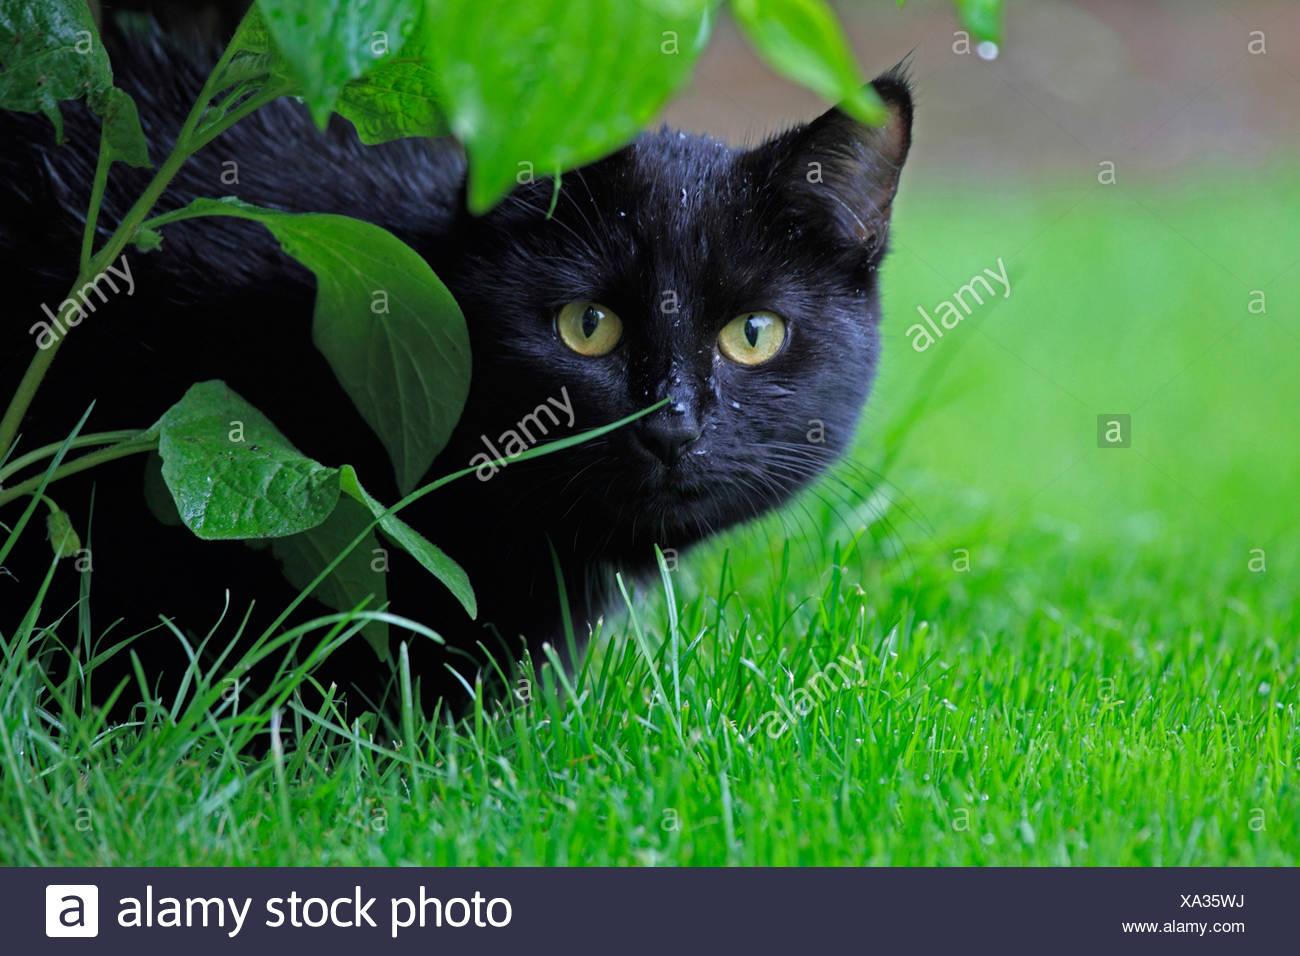 domestic cat, house cat (Felis silvestris f. catus), black cat in the garden, Germany - Stock Image